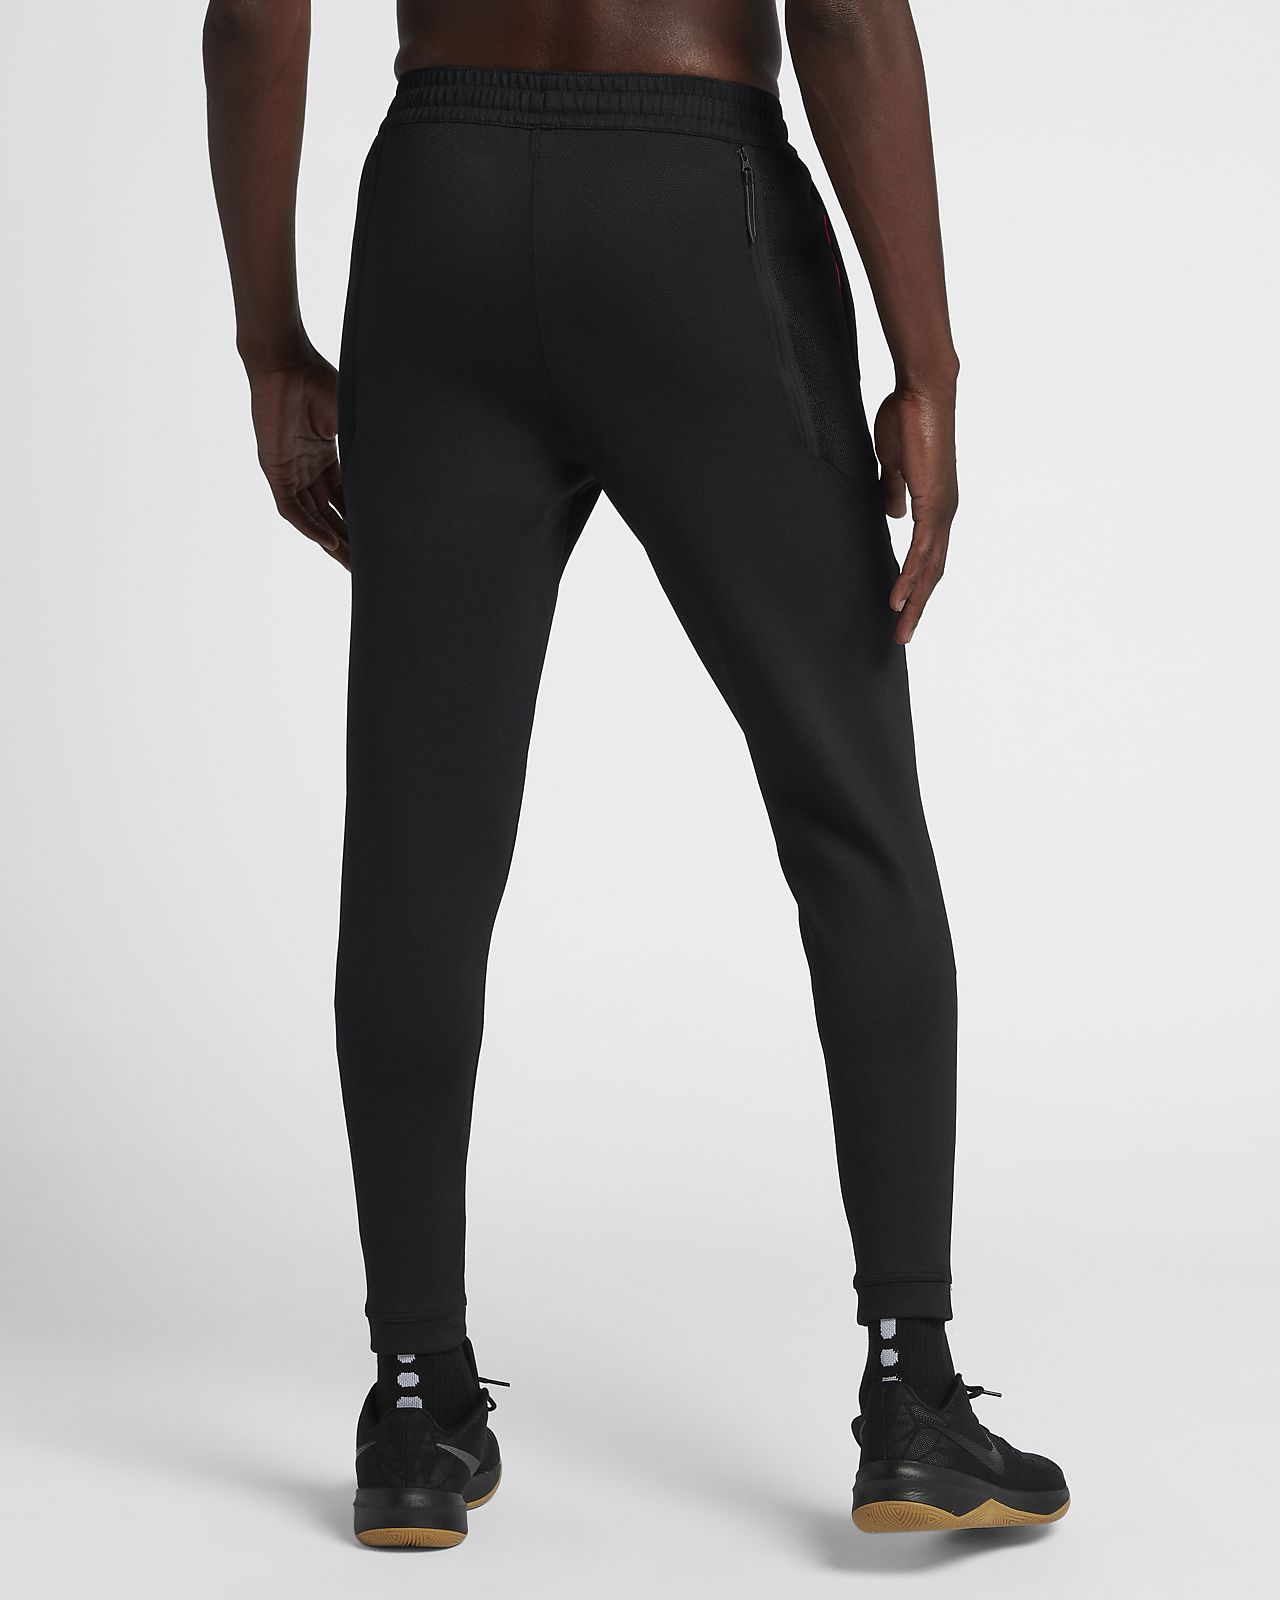 3b2d942b2638 Nike Therma Flex Showtime Men s Basketball Trousers. Nike.com GB